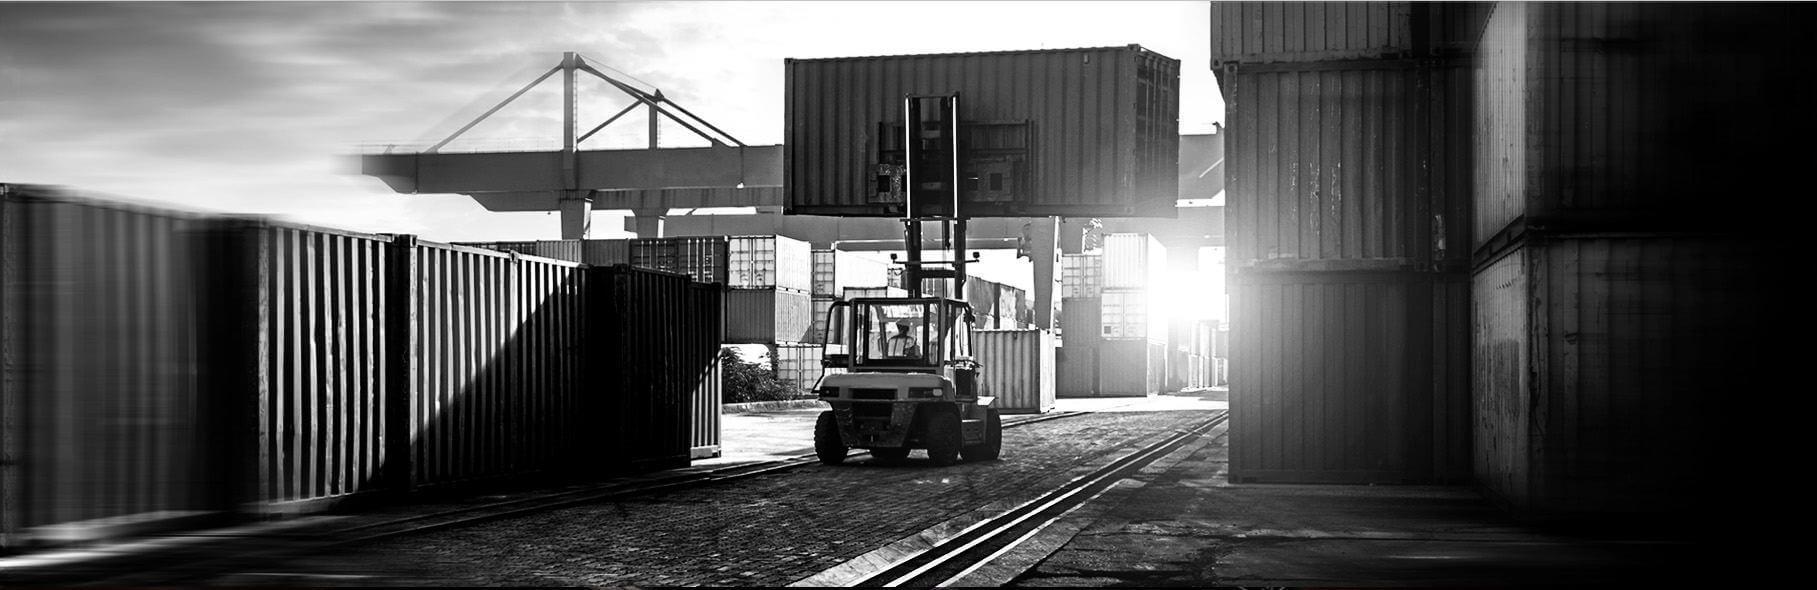 containertransport-mit-gabelstapler